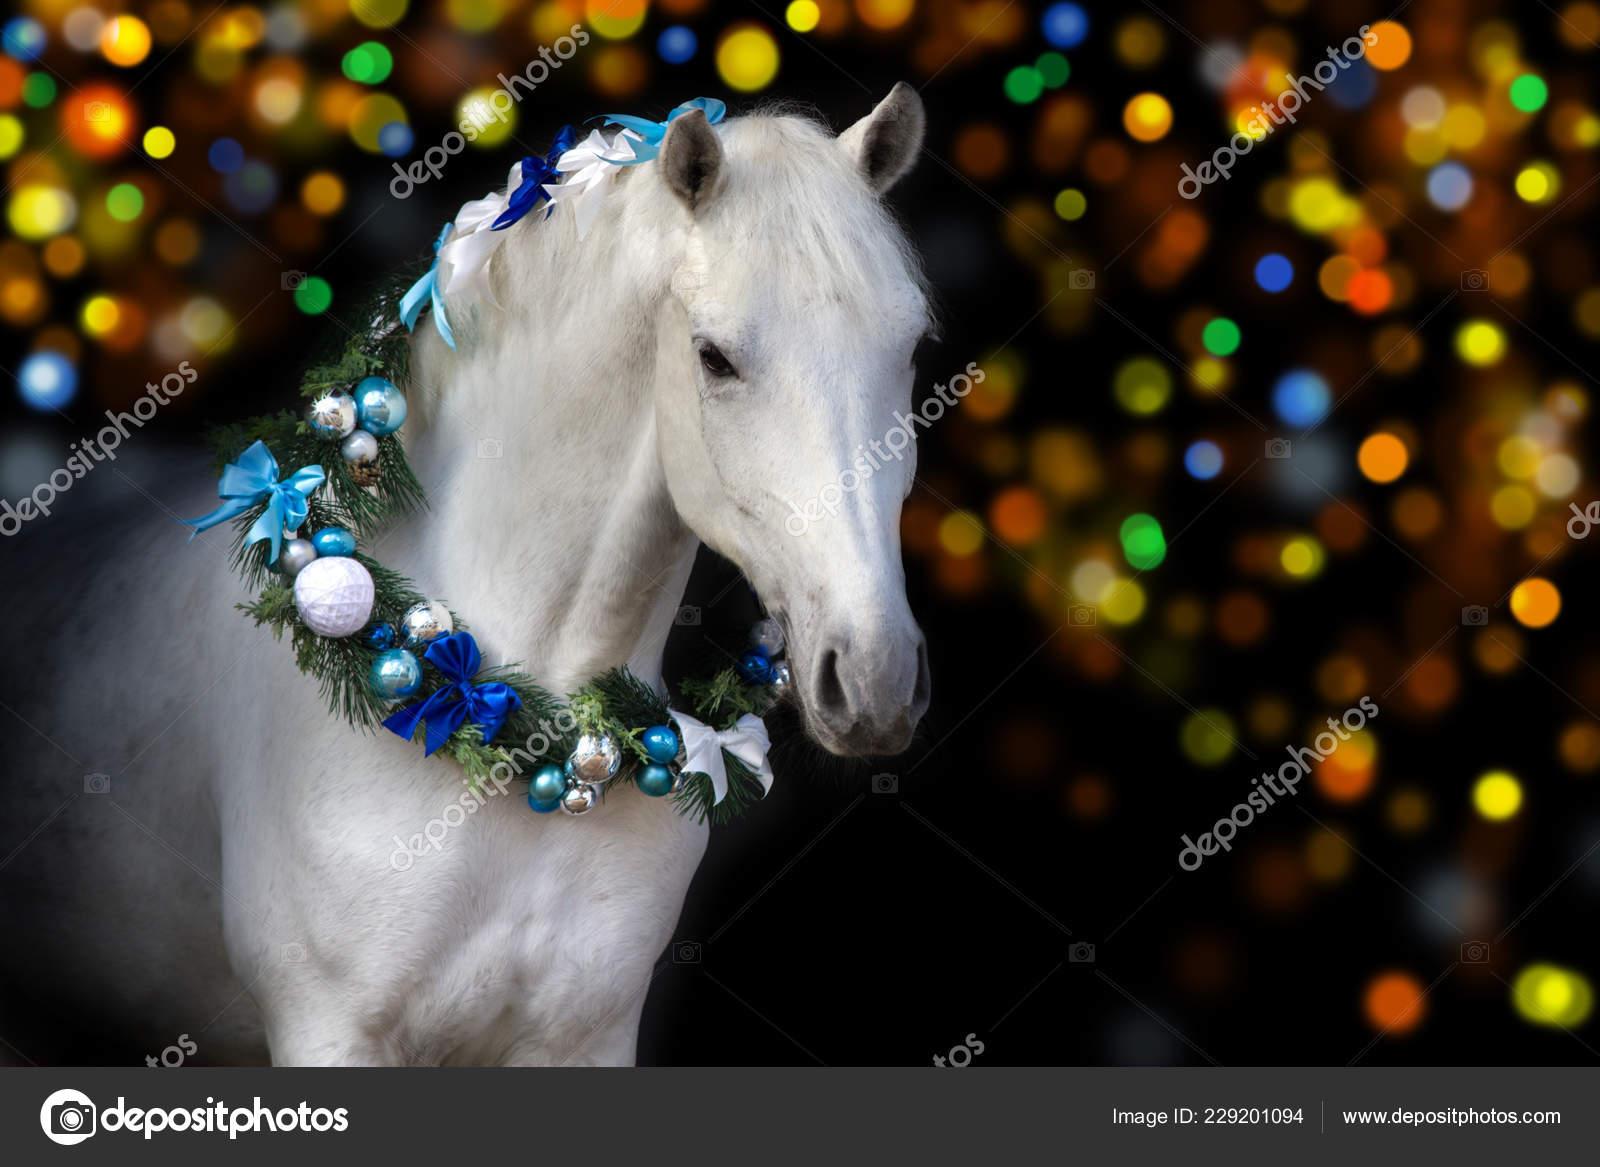 Portrait White Horse Christmas Decorations Black Background Lights Bokeh Stock Photo C Callipso Art 229201094